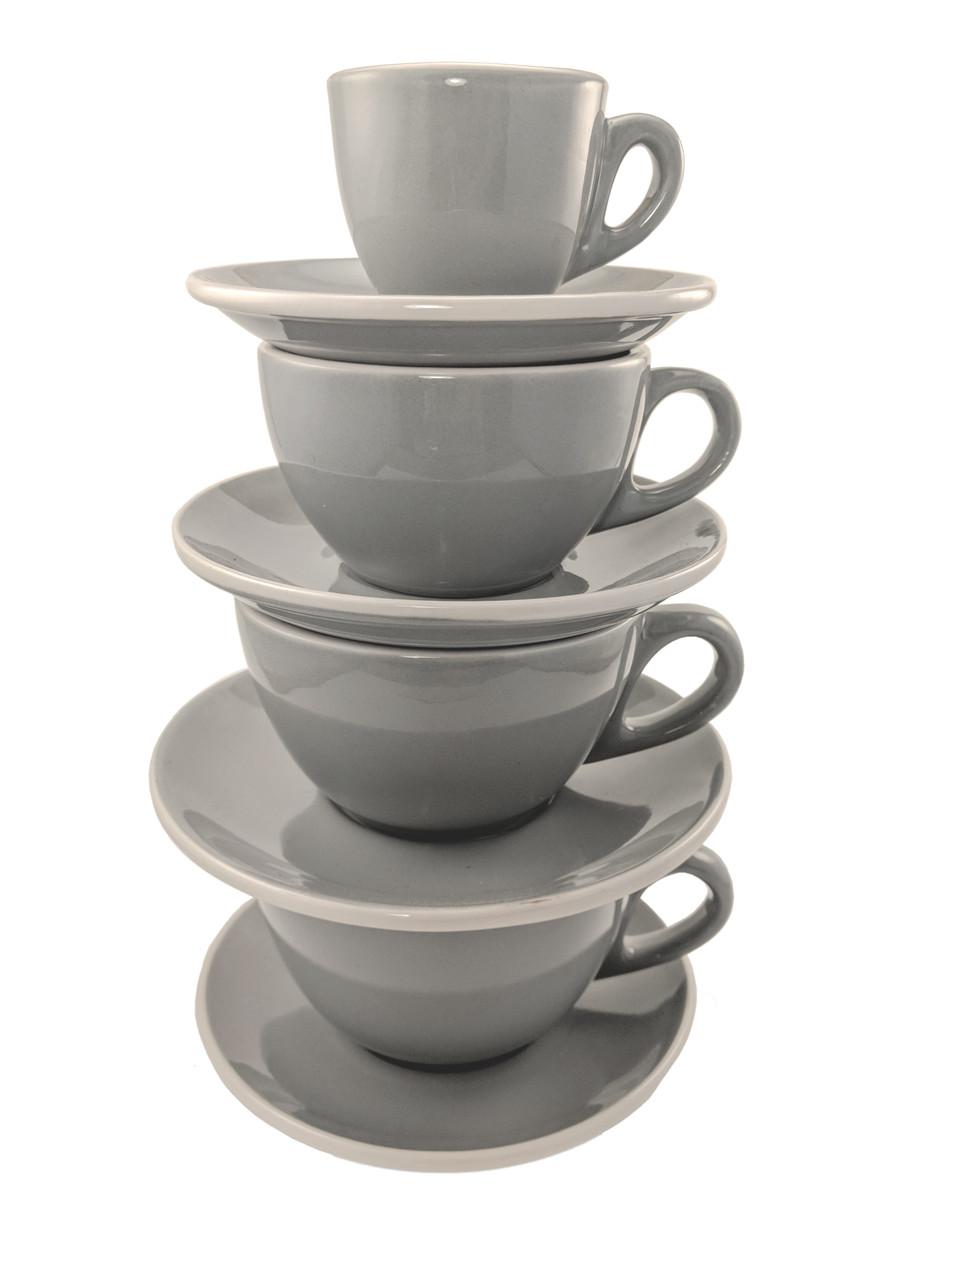 Revolution Classic Cup & Saucer Set, Gray